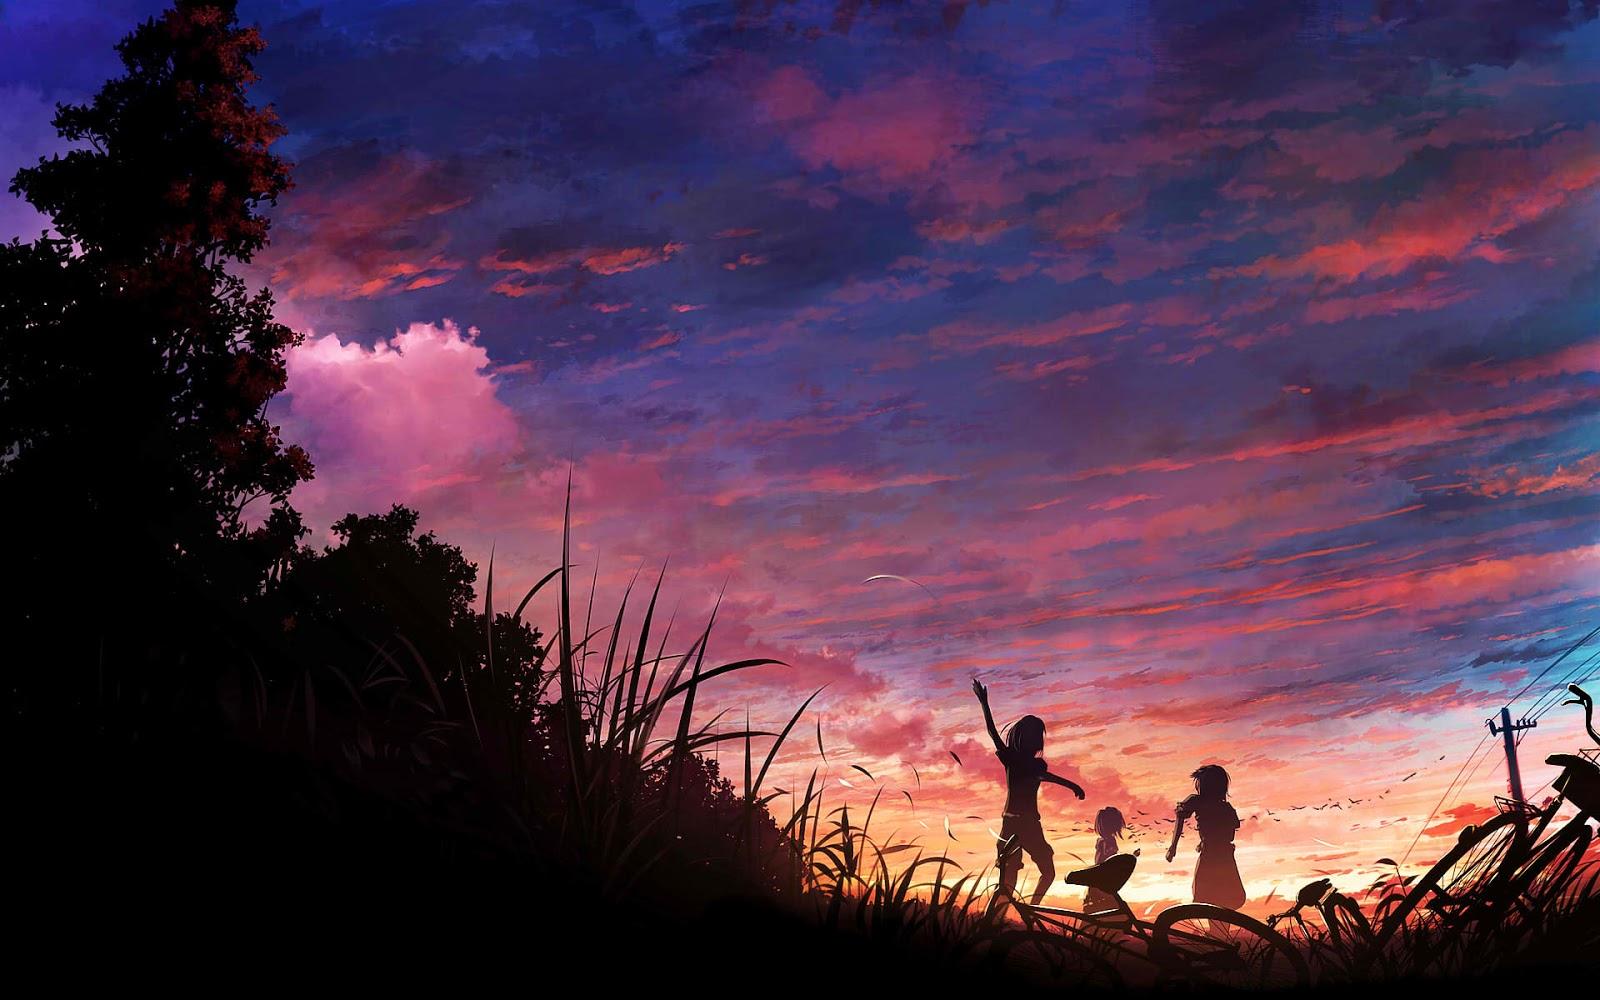 image Beautiful world evangelion theme song